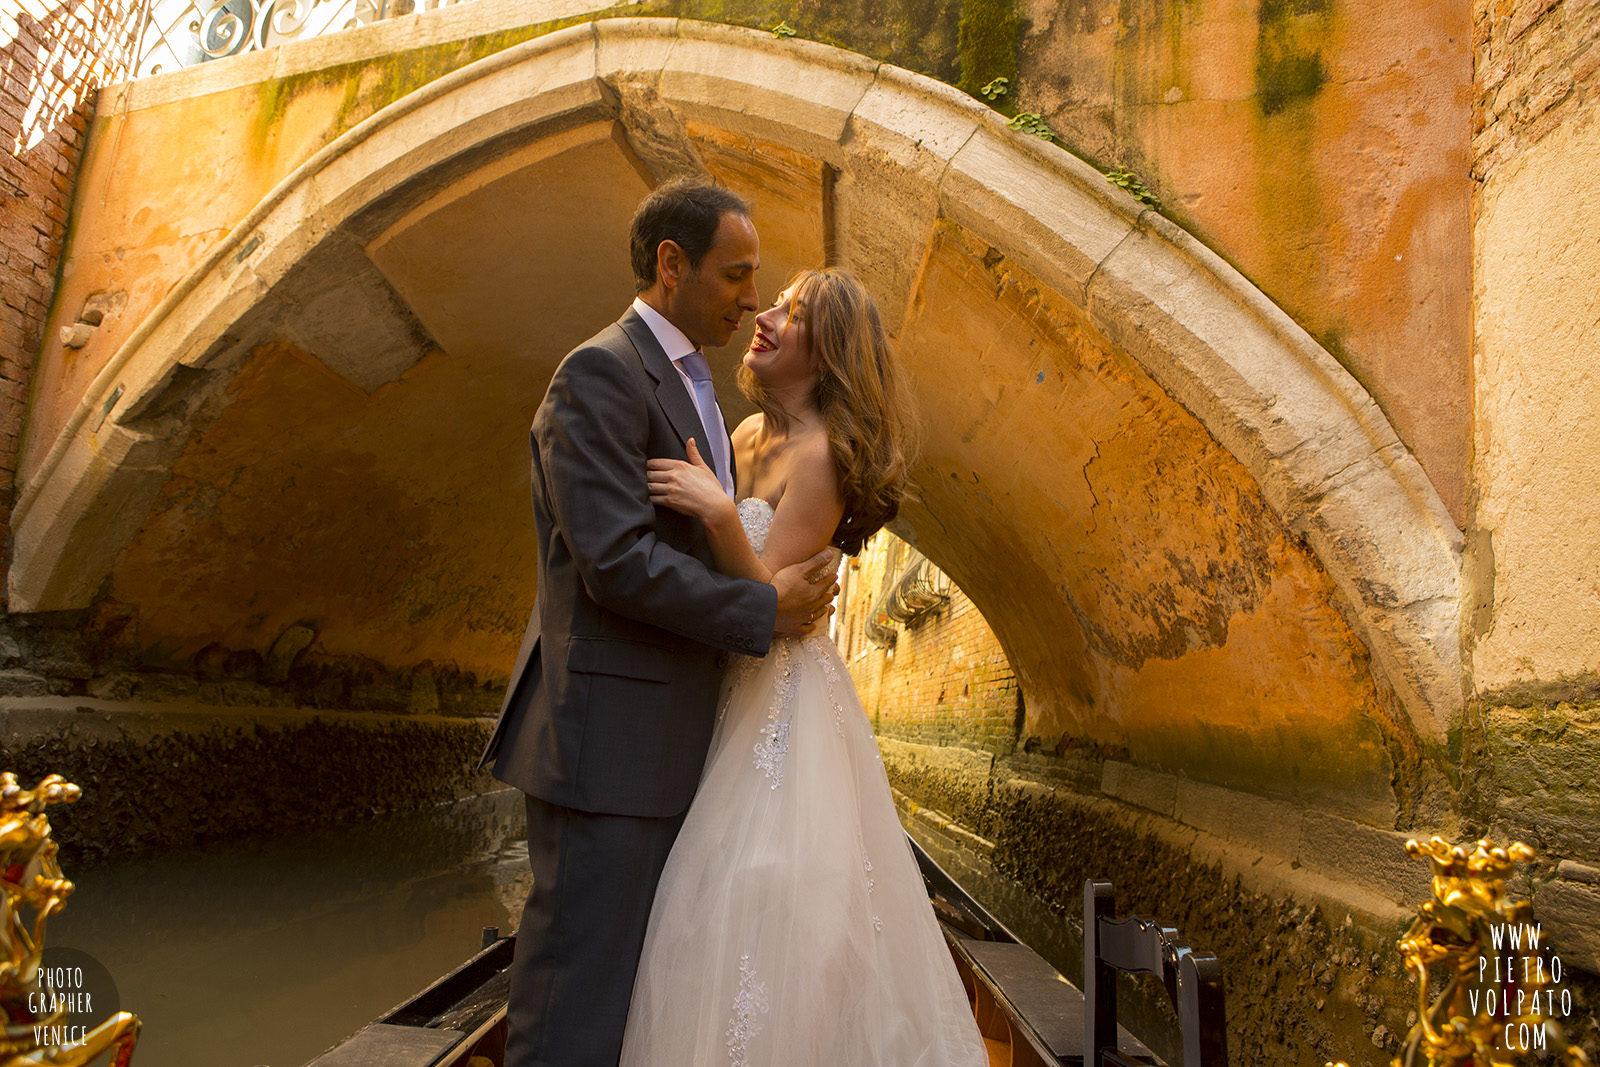 venice-wedding-honeymoon-photographer-20140312_11